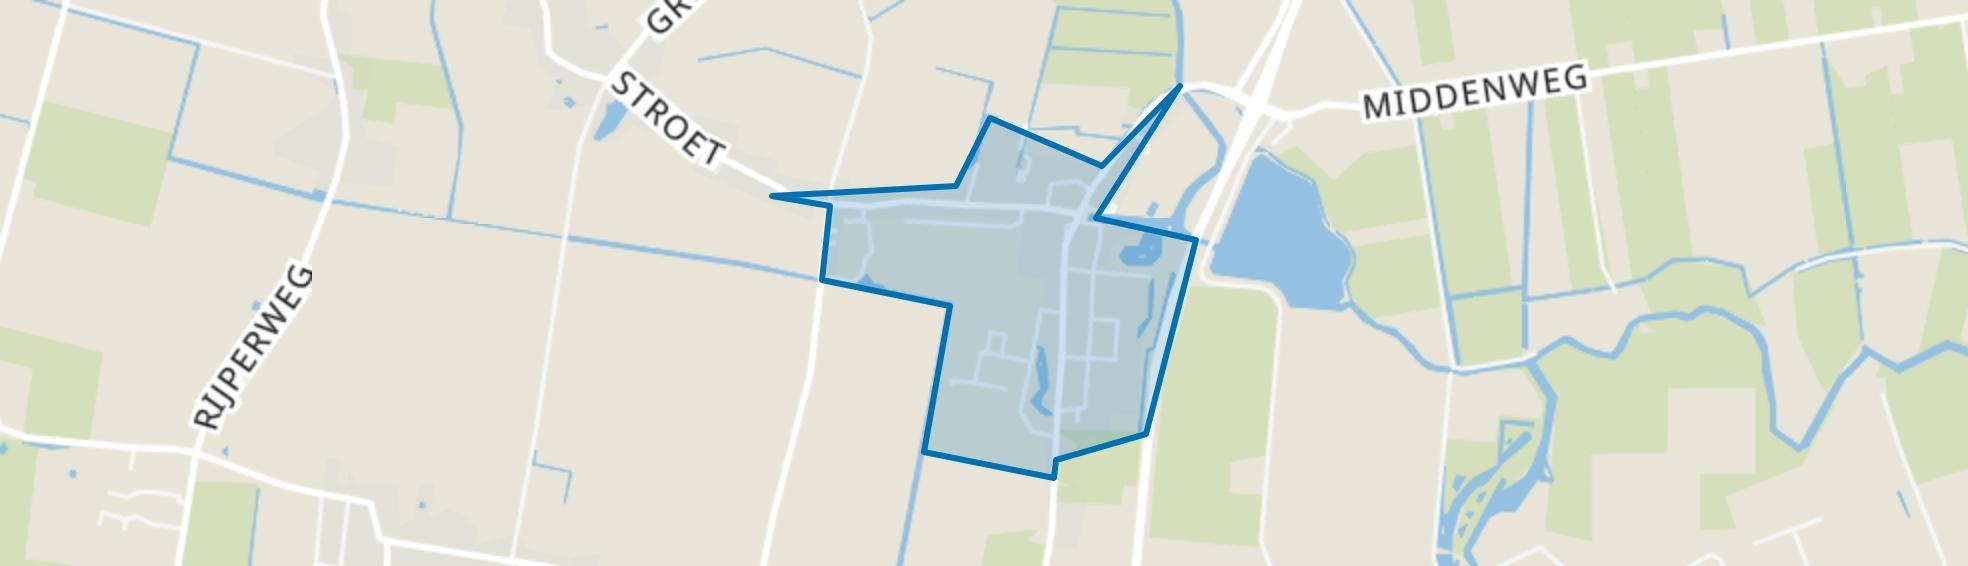 Dirkshorn (woonkern), Dirkshorn map